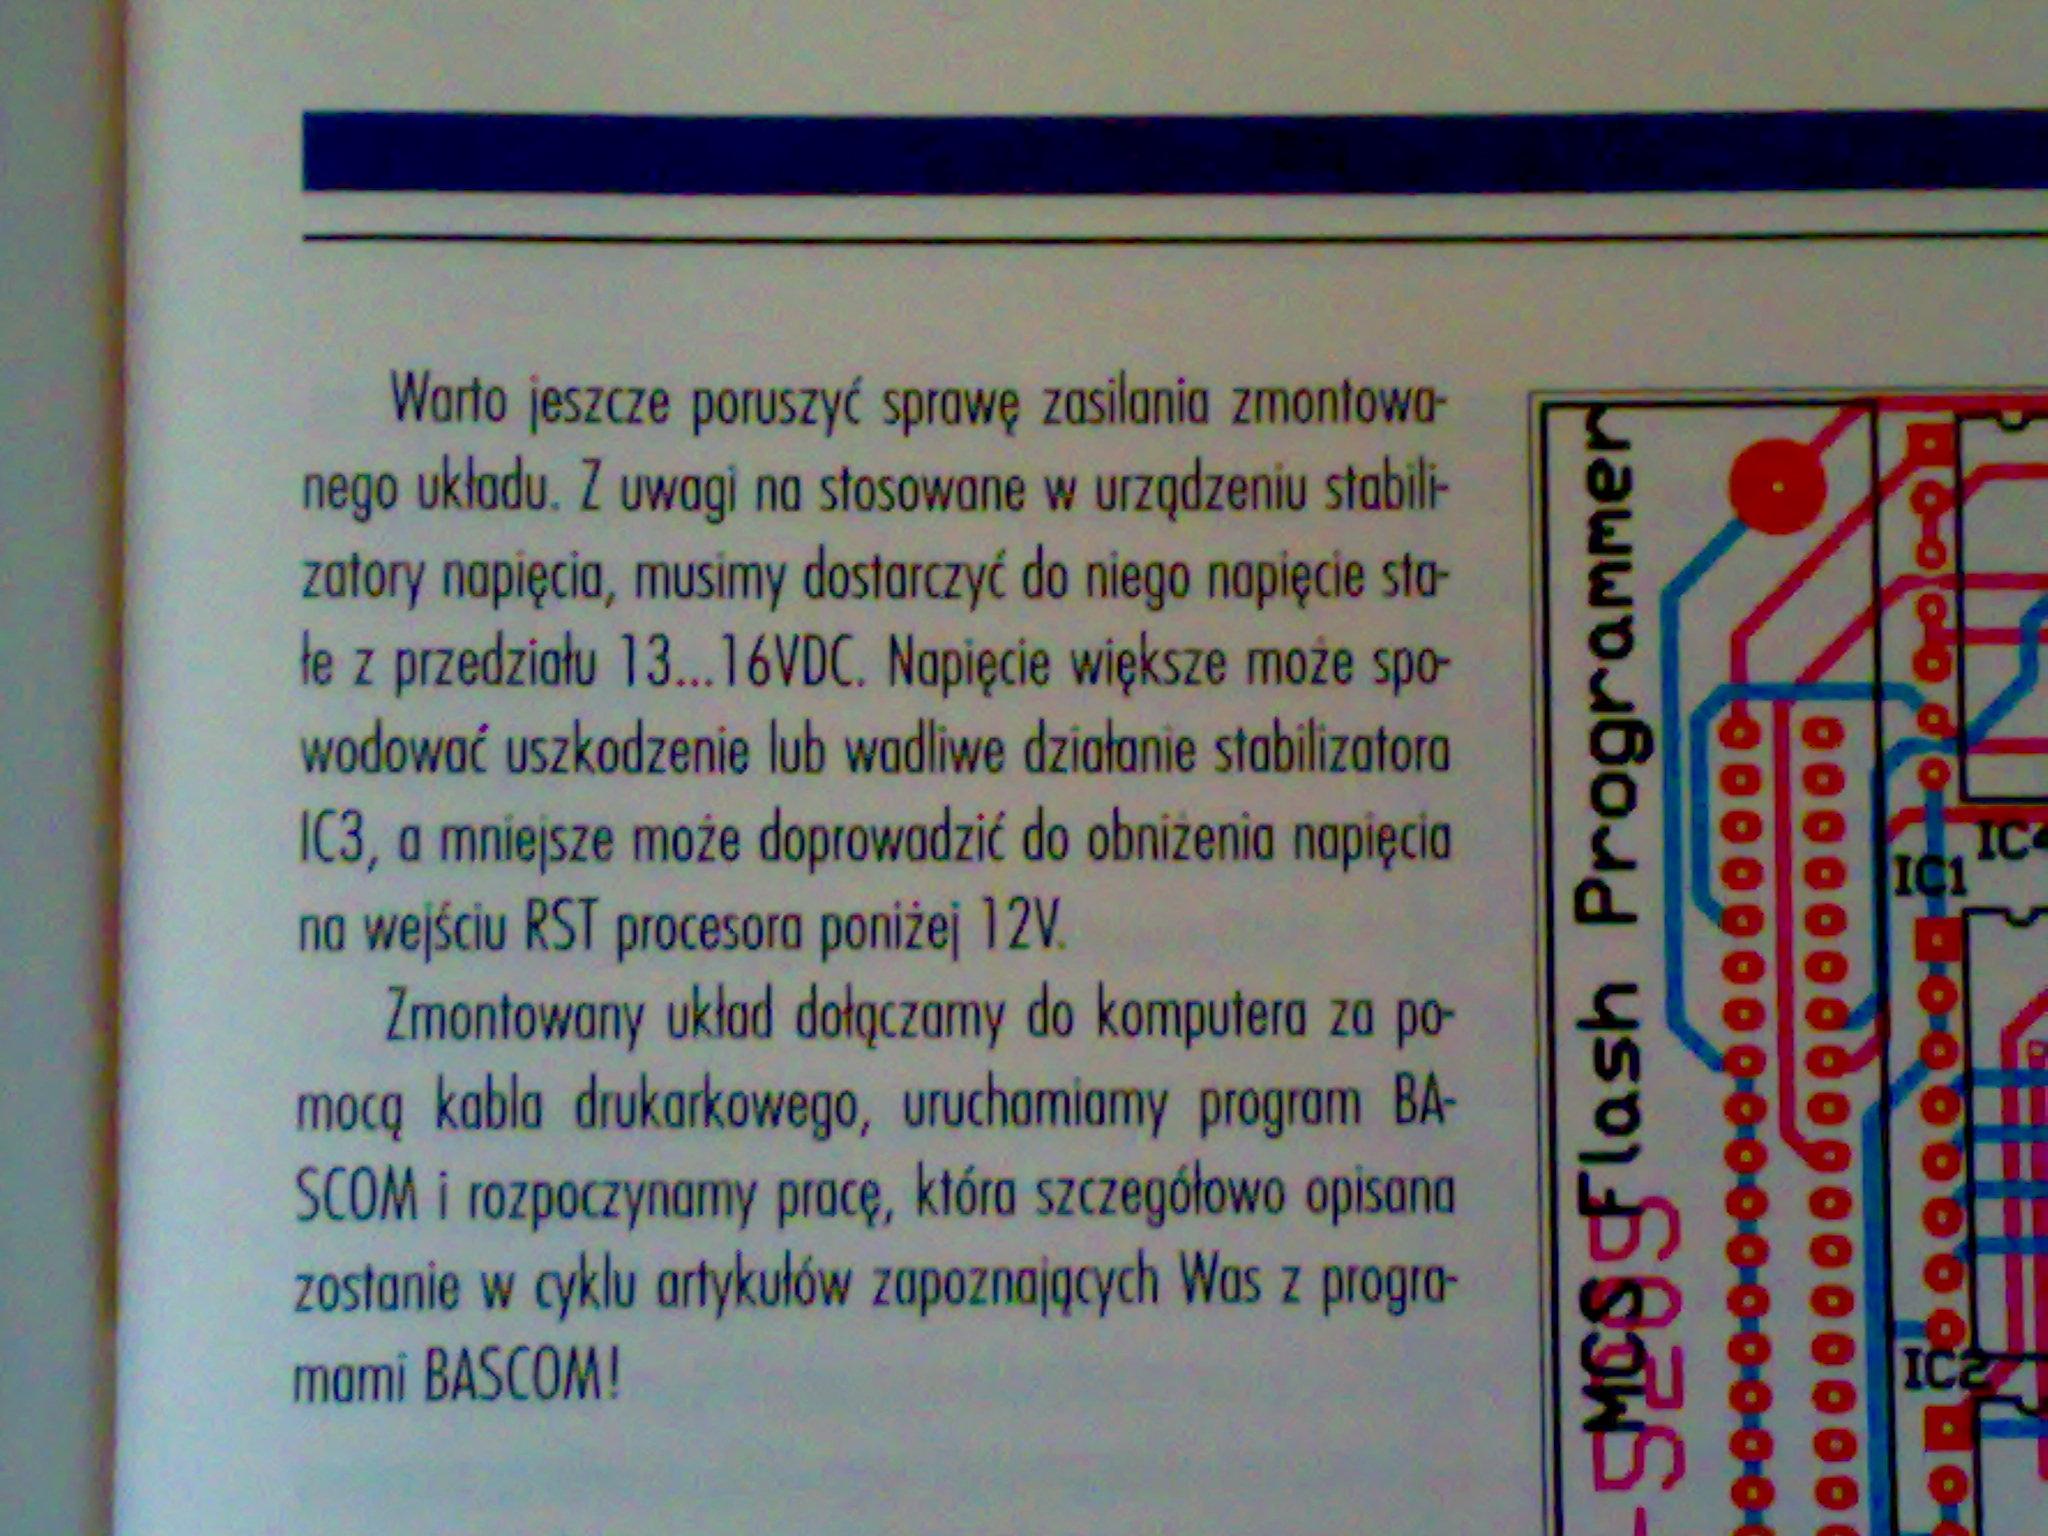 BASCOM - chip not the same as buffer. Co jest nie tak ?